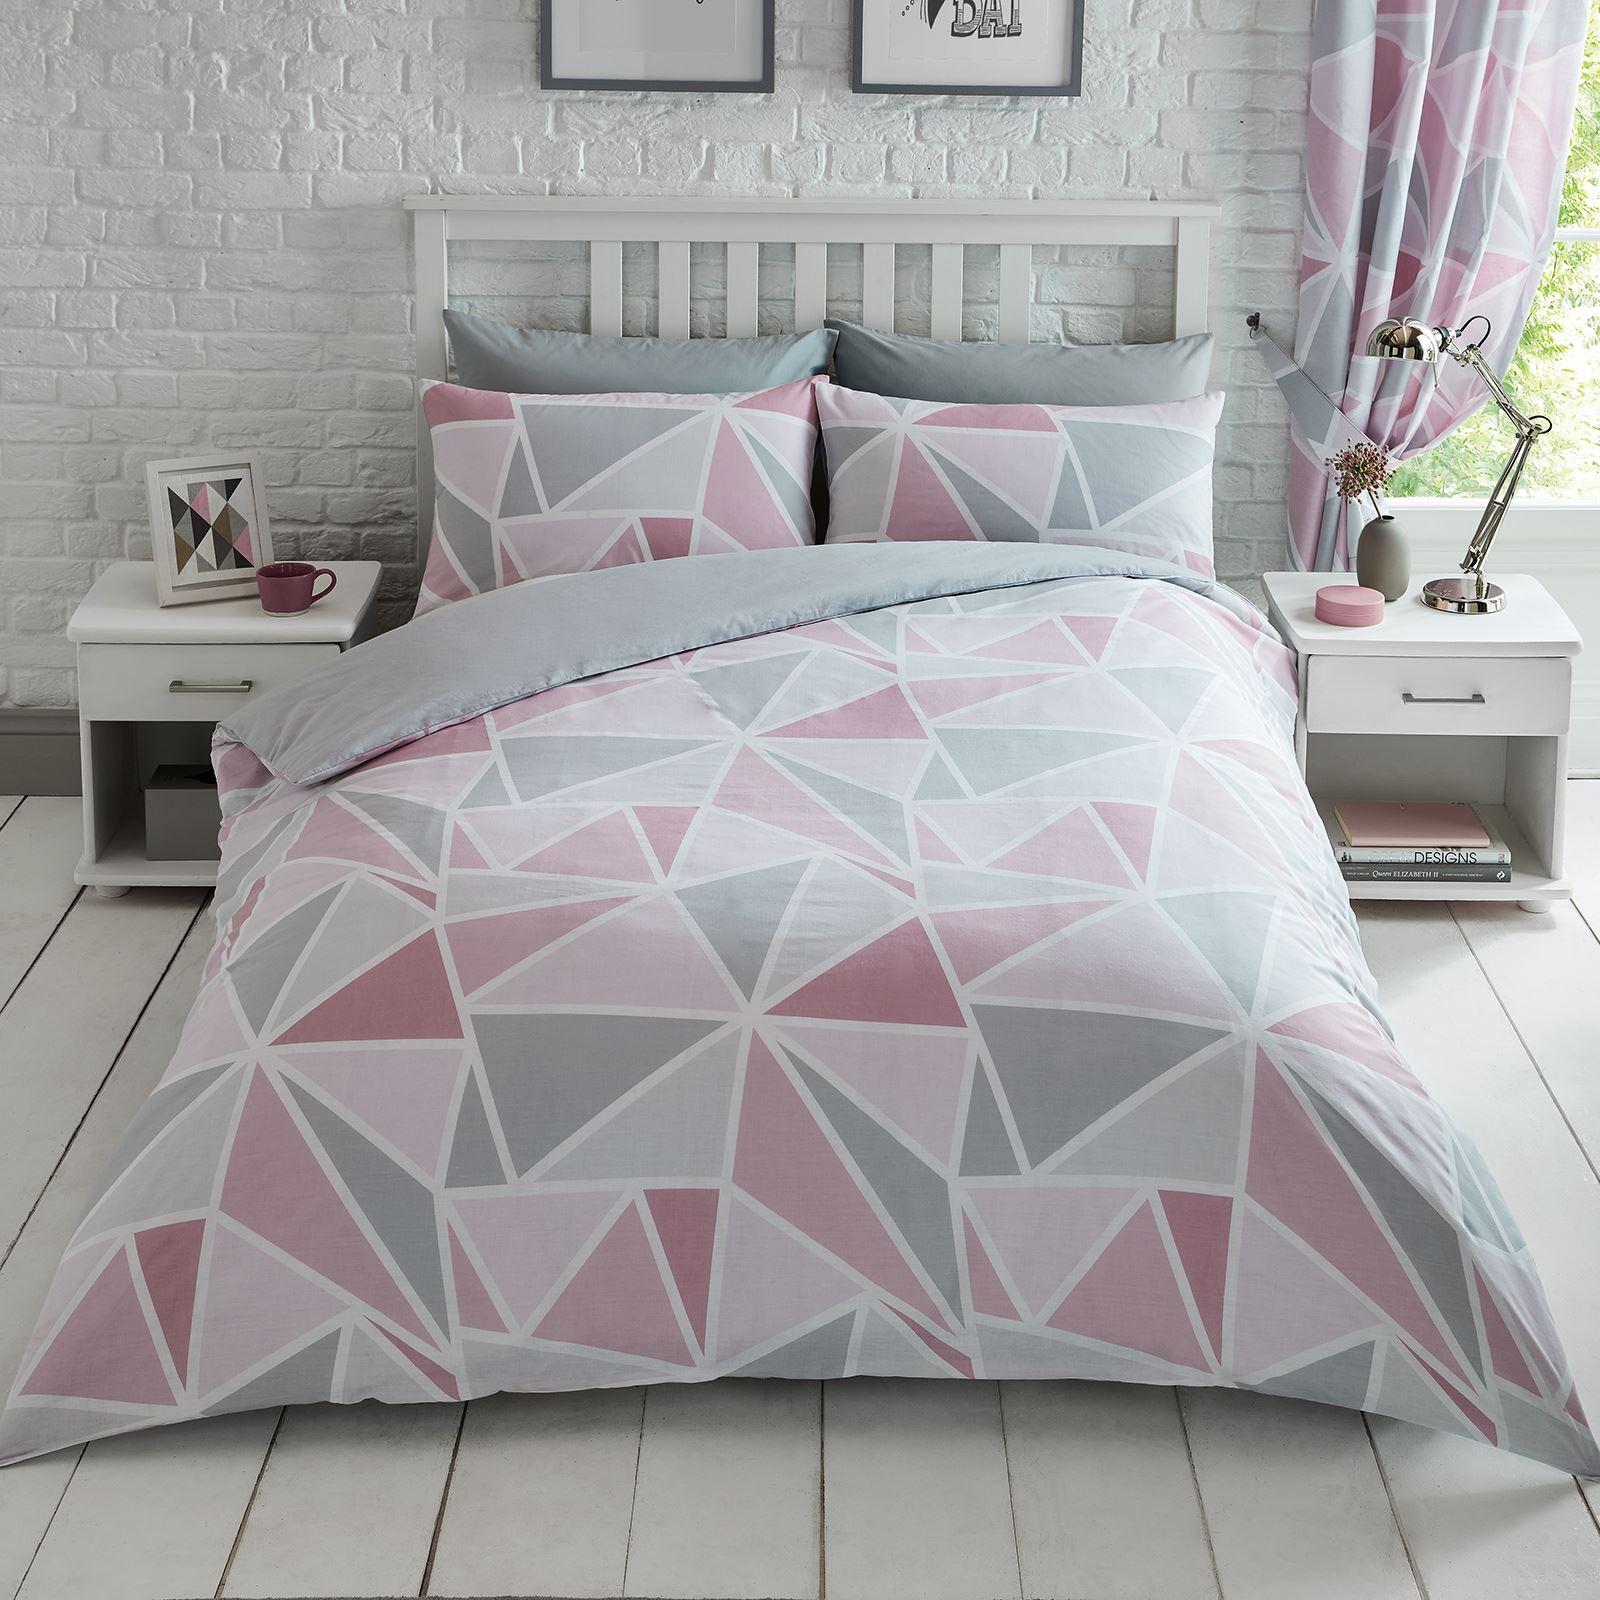 Metro Triangle Single Duvet Cover Set Pink Grey Modern Geometric Bedding 5051346158110 Ebay